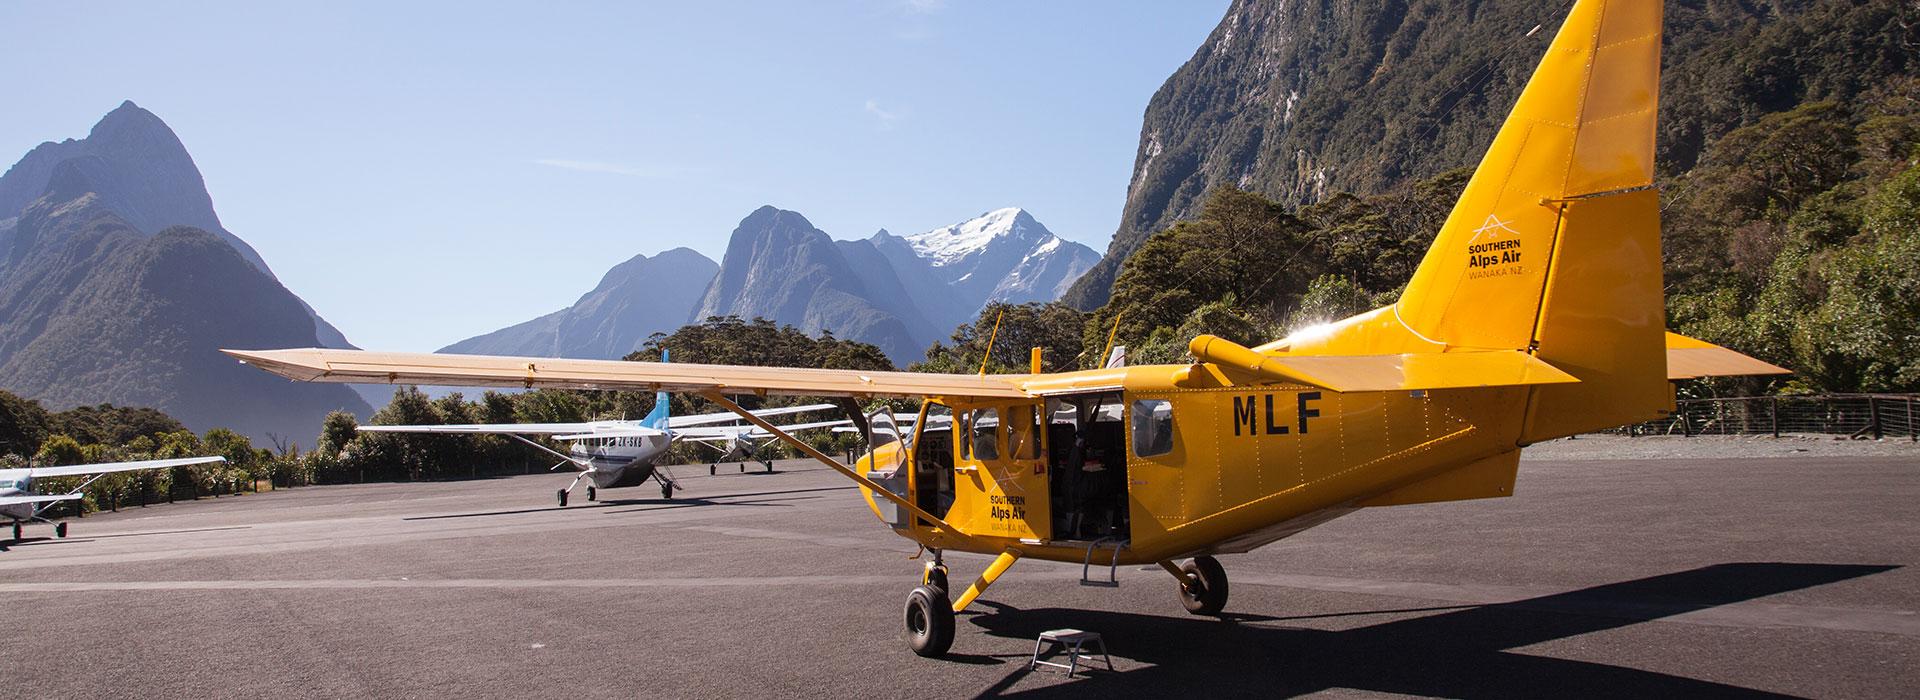 Milford Sound Flight + Landing & Glaciers $399pp (was $515)